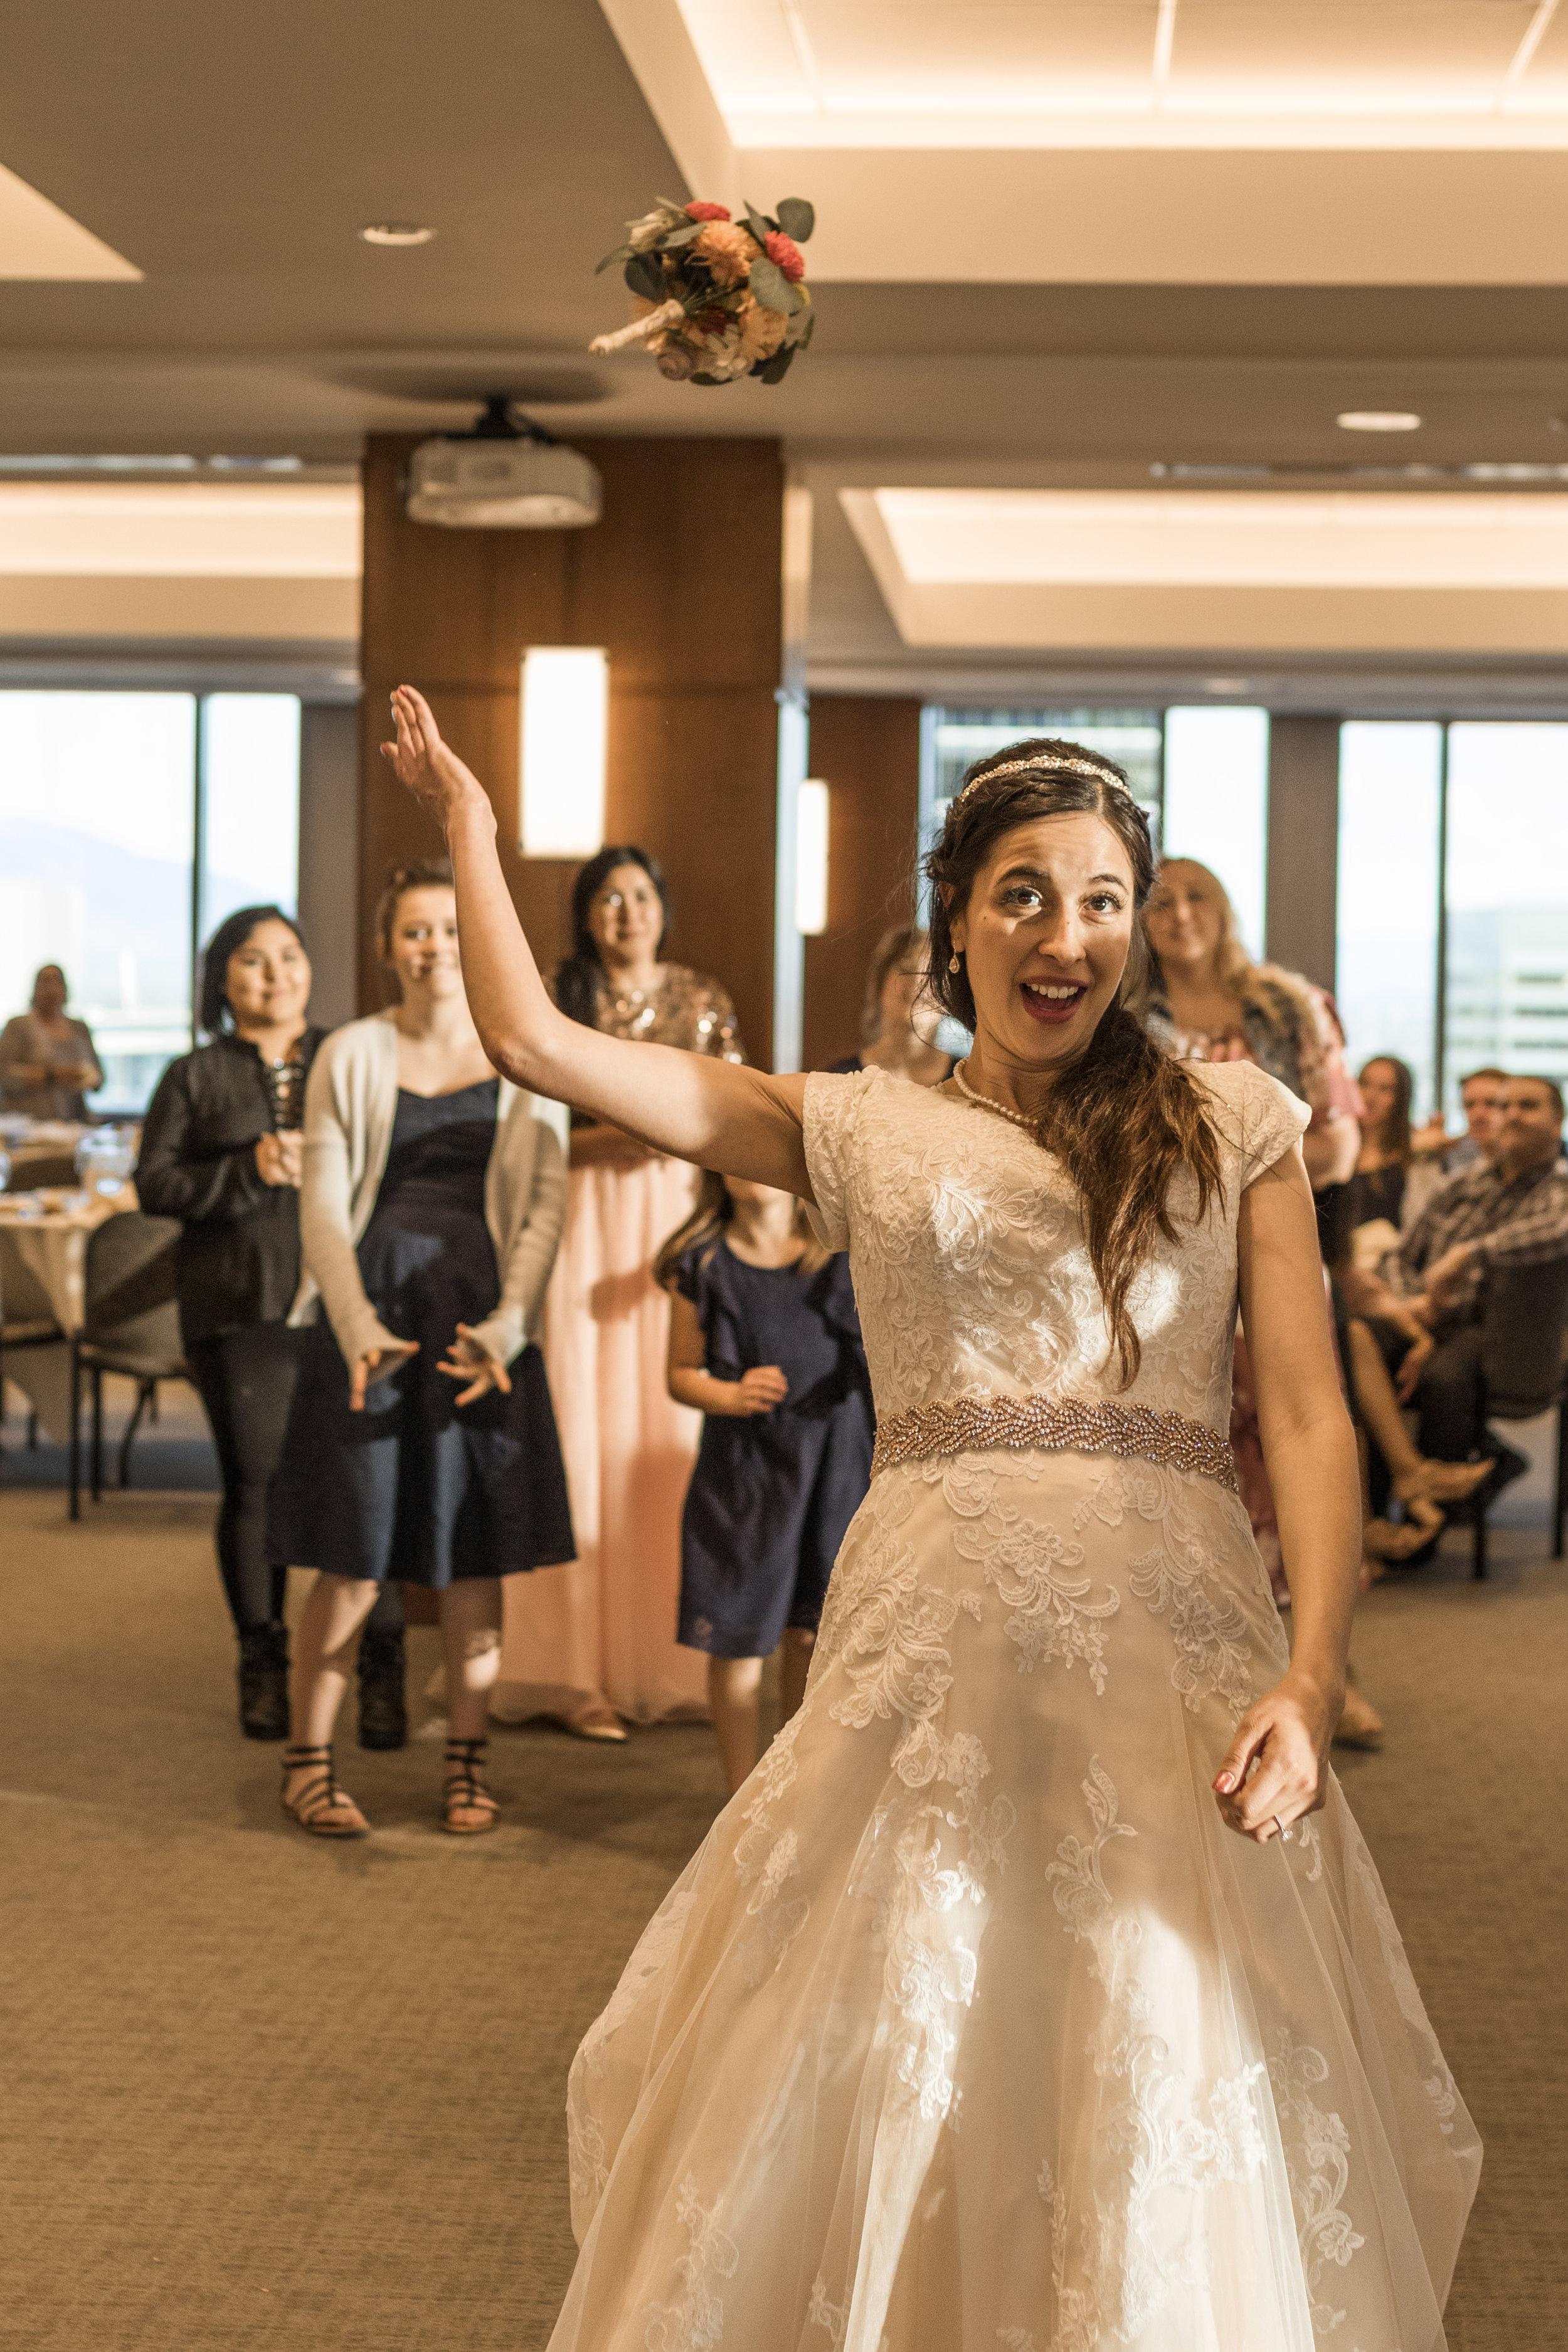 Utah Spring Wedding Reception in the Zions Bank Founders Room by Bri Bergman Photography19.JPG